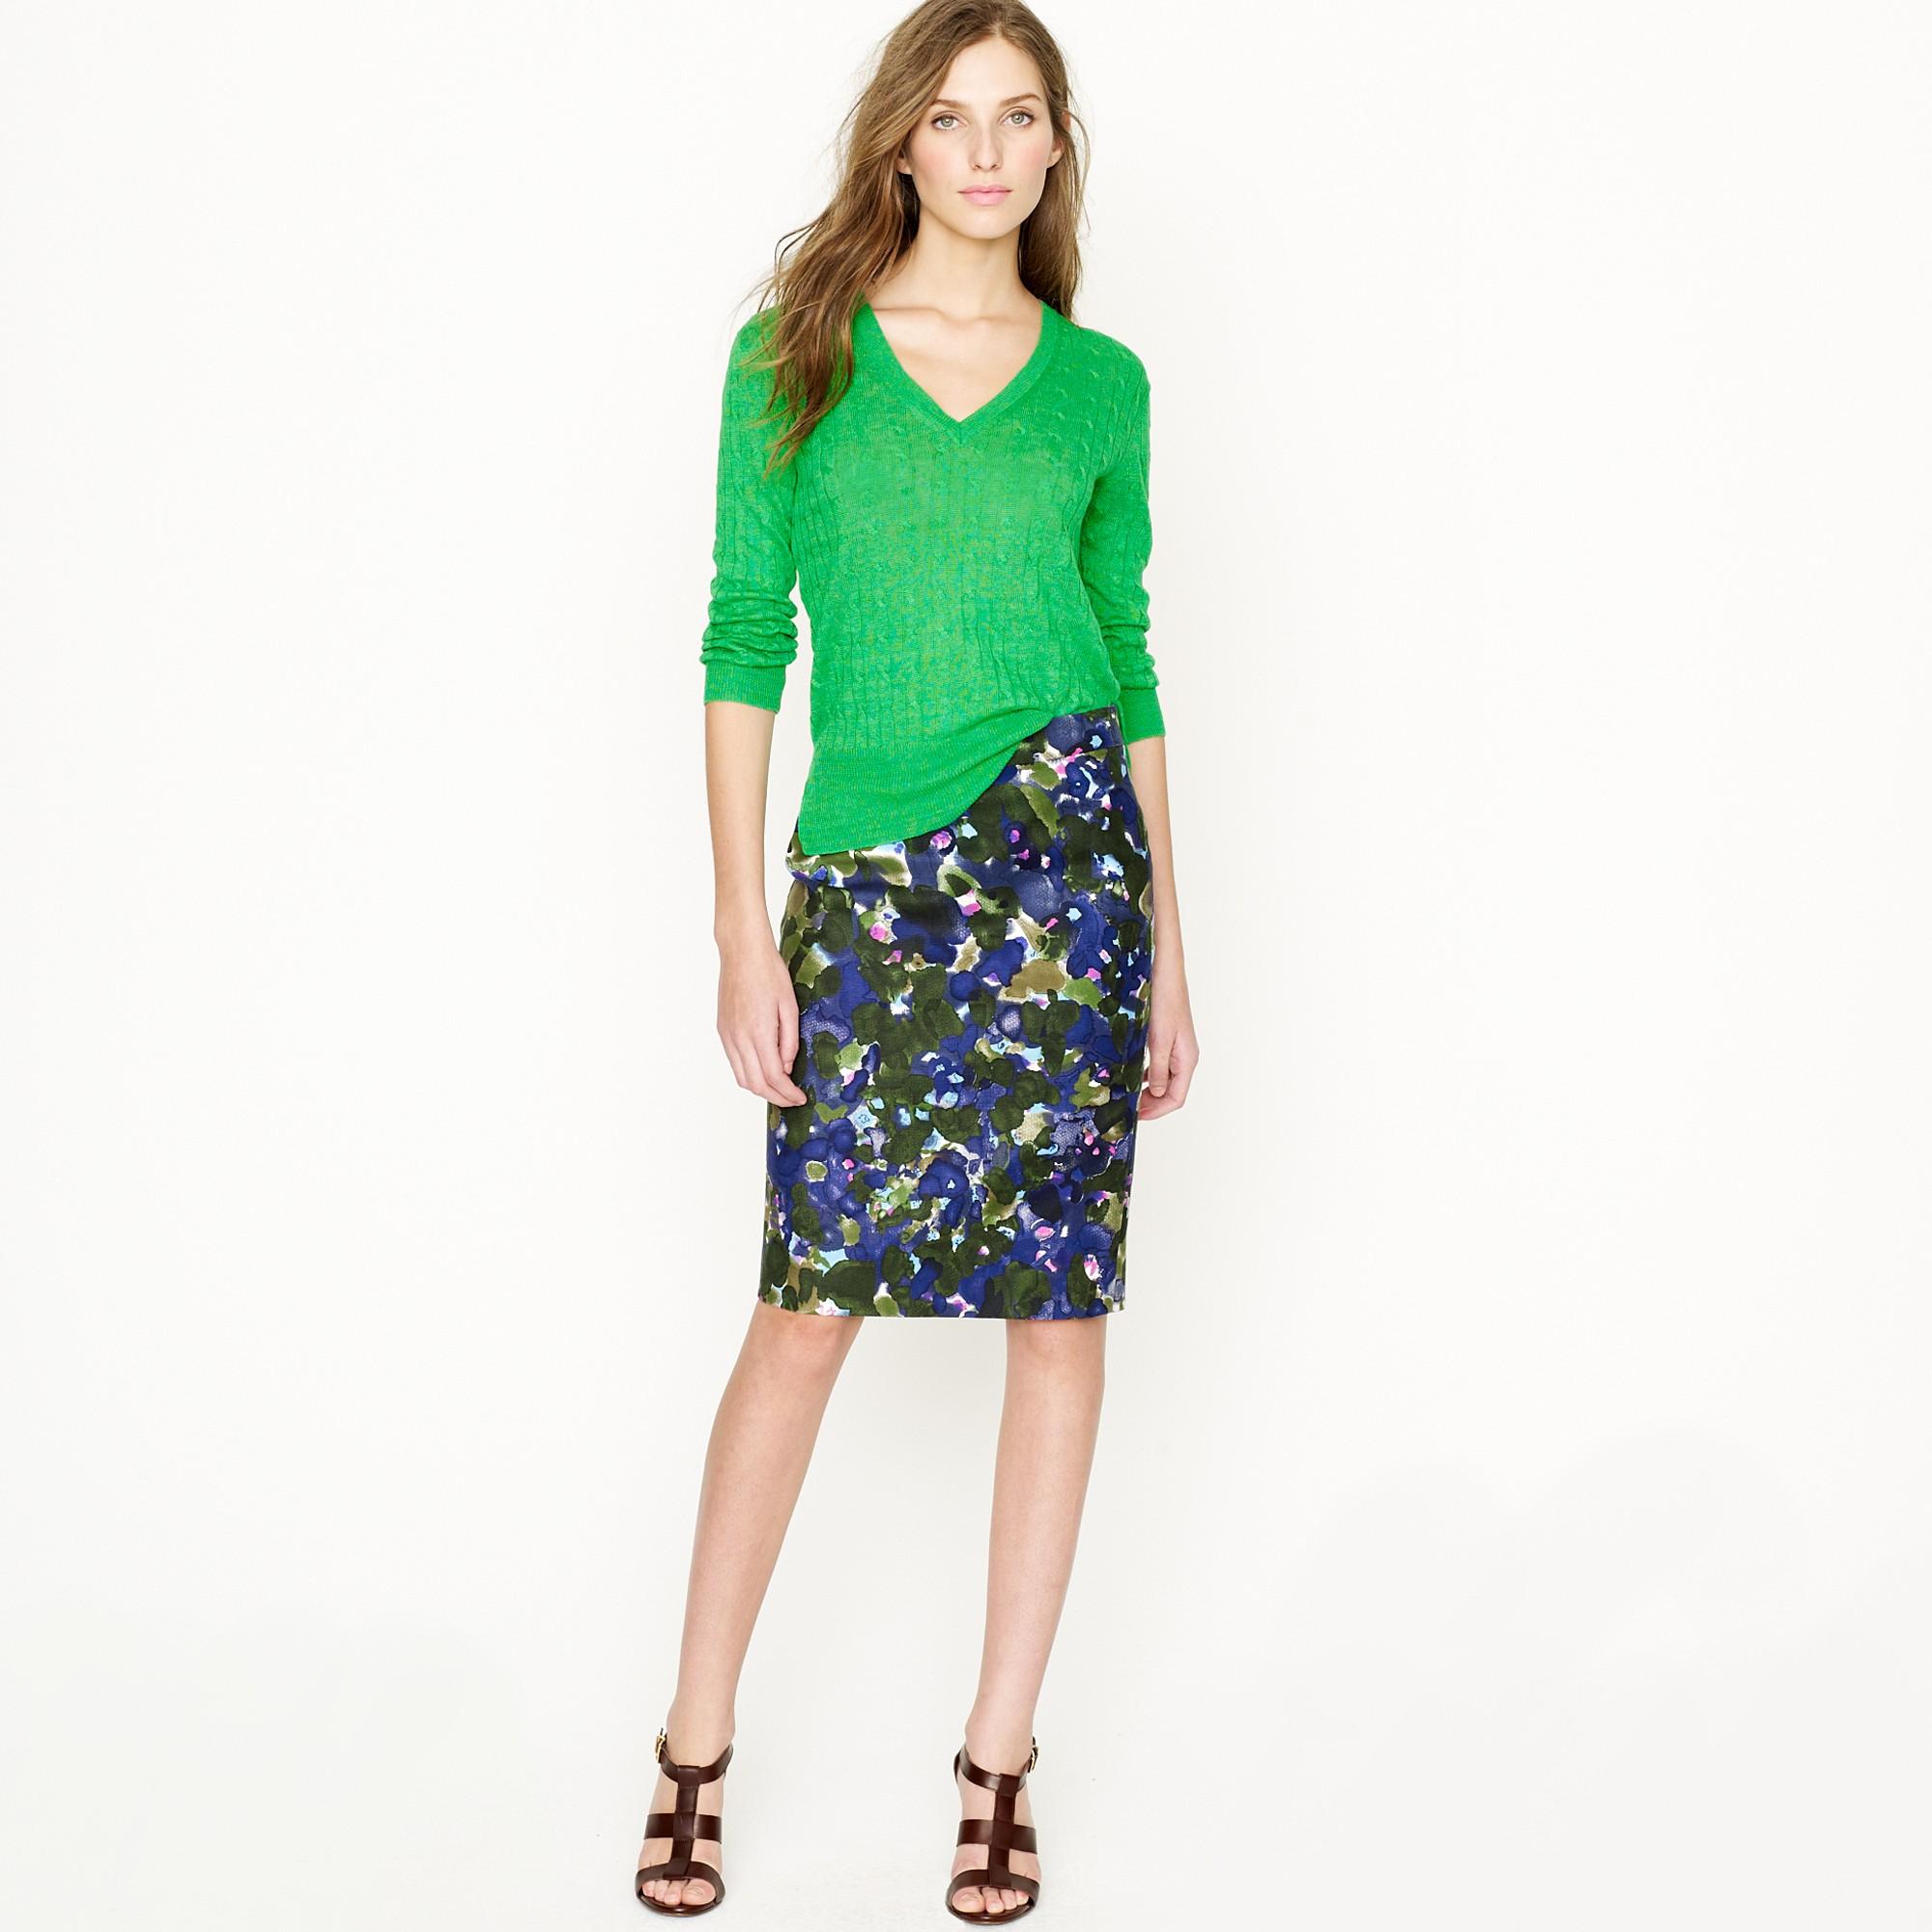 floral pencil skirt - photo #18